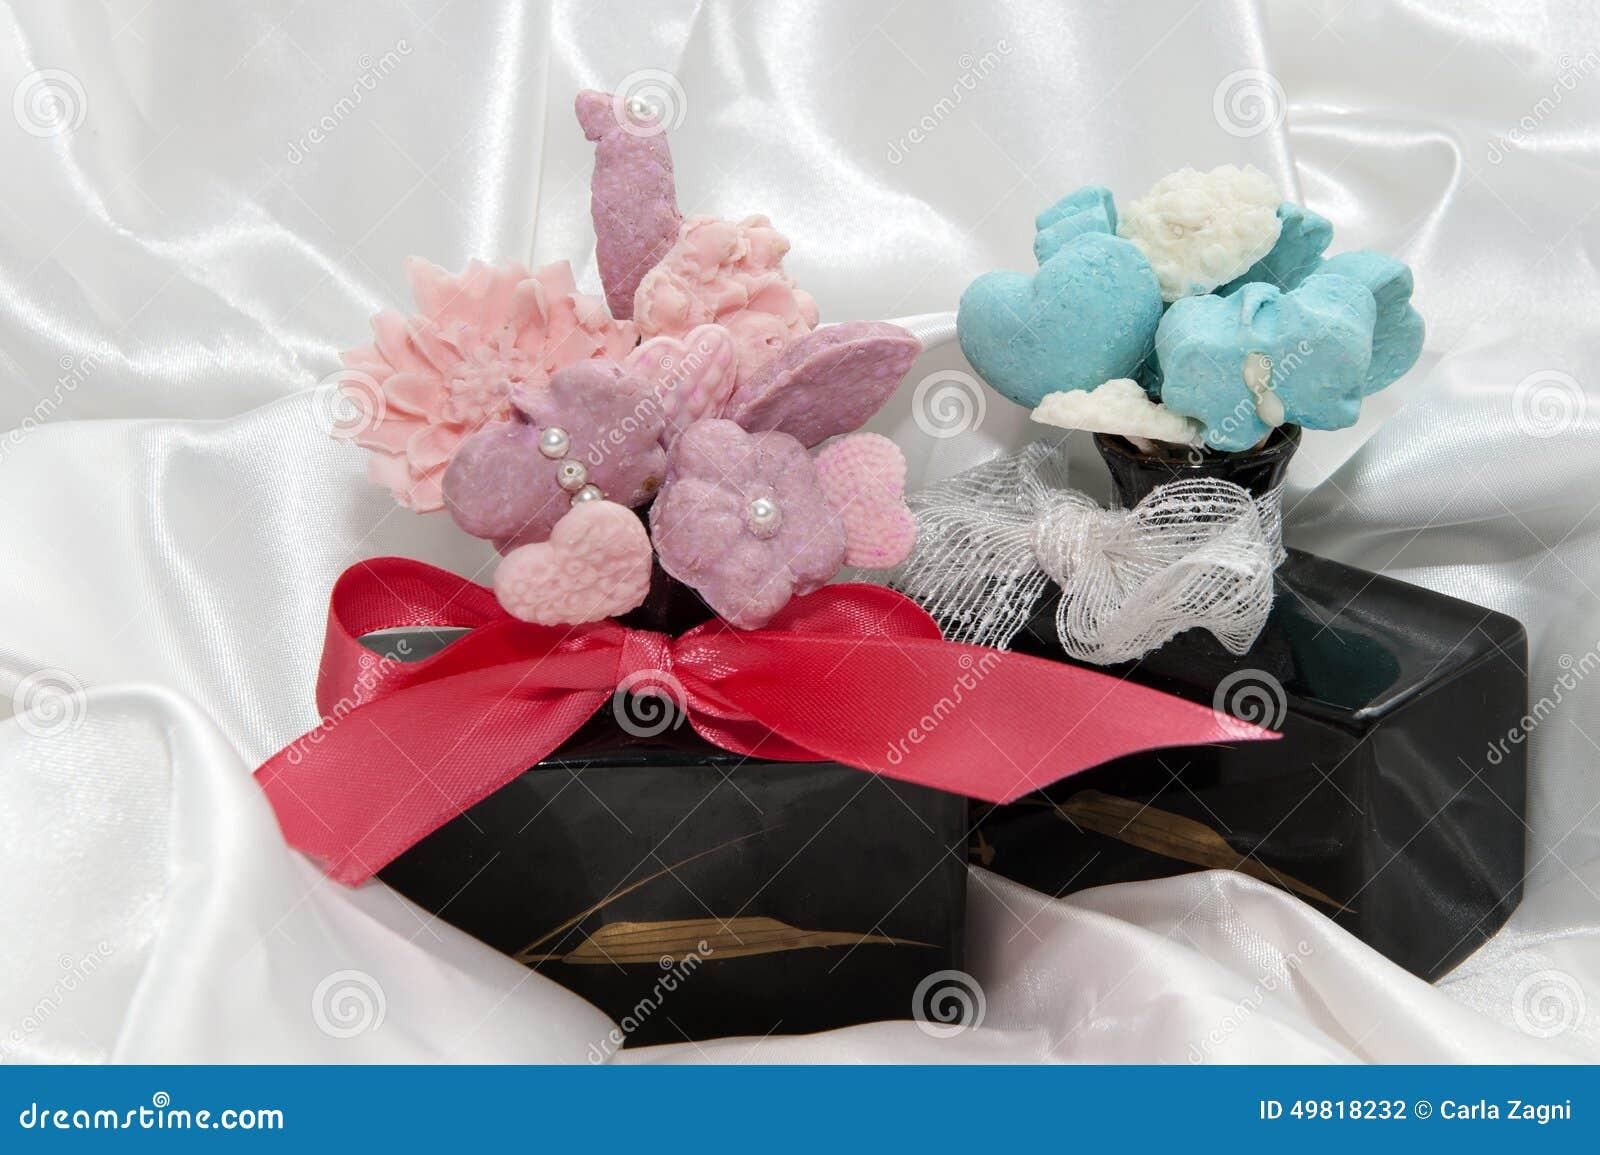 Wedding Fawors Whit Soap Flower Stock Photo - Image of homemade ...